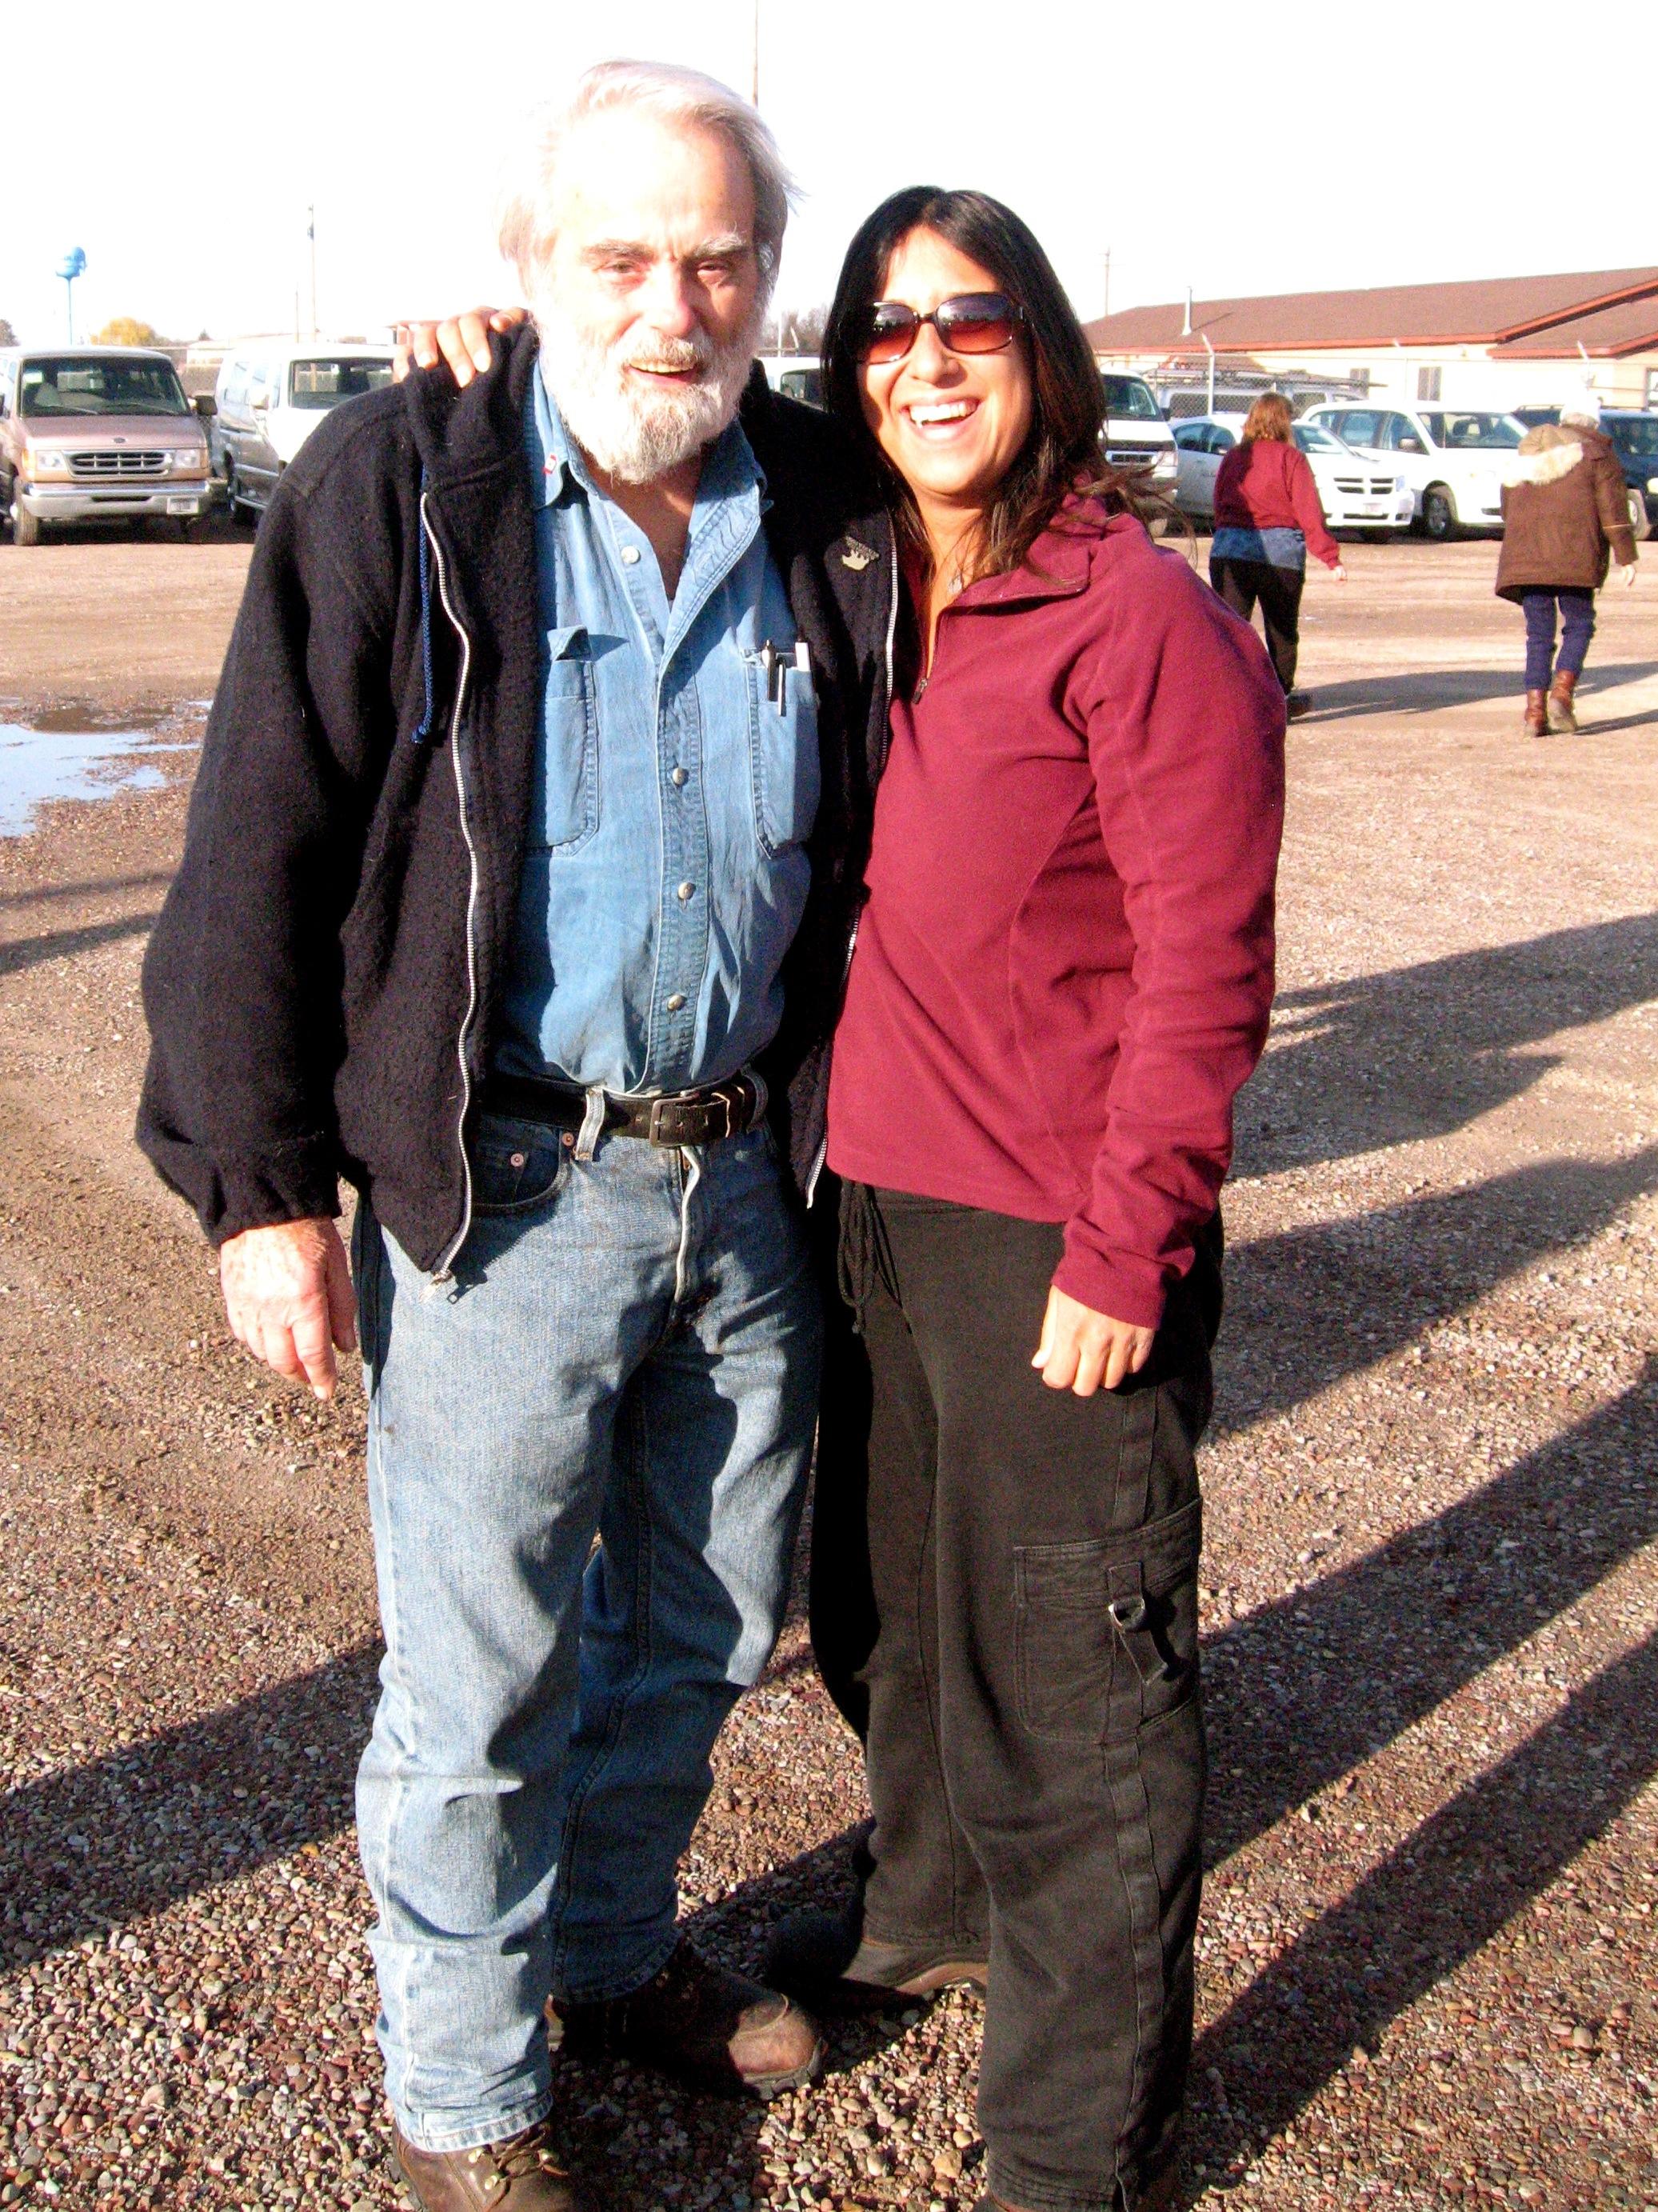 Dr. Charles Jonkel and Me, Missoula Montana Nov 18